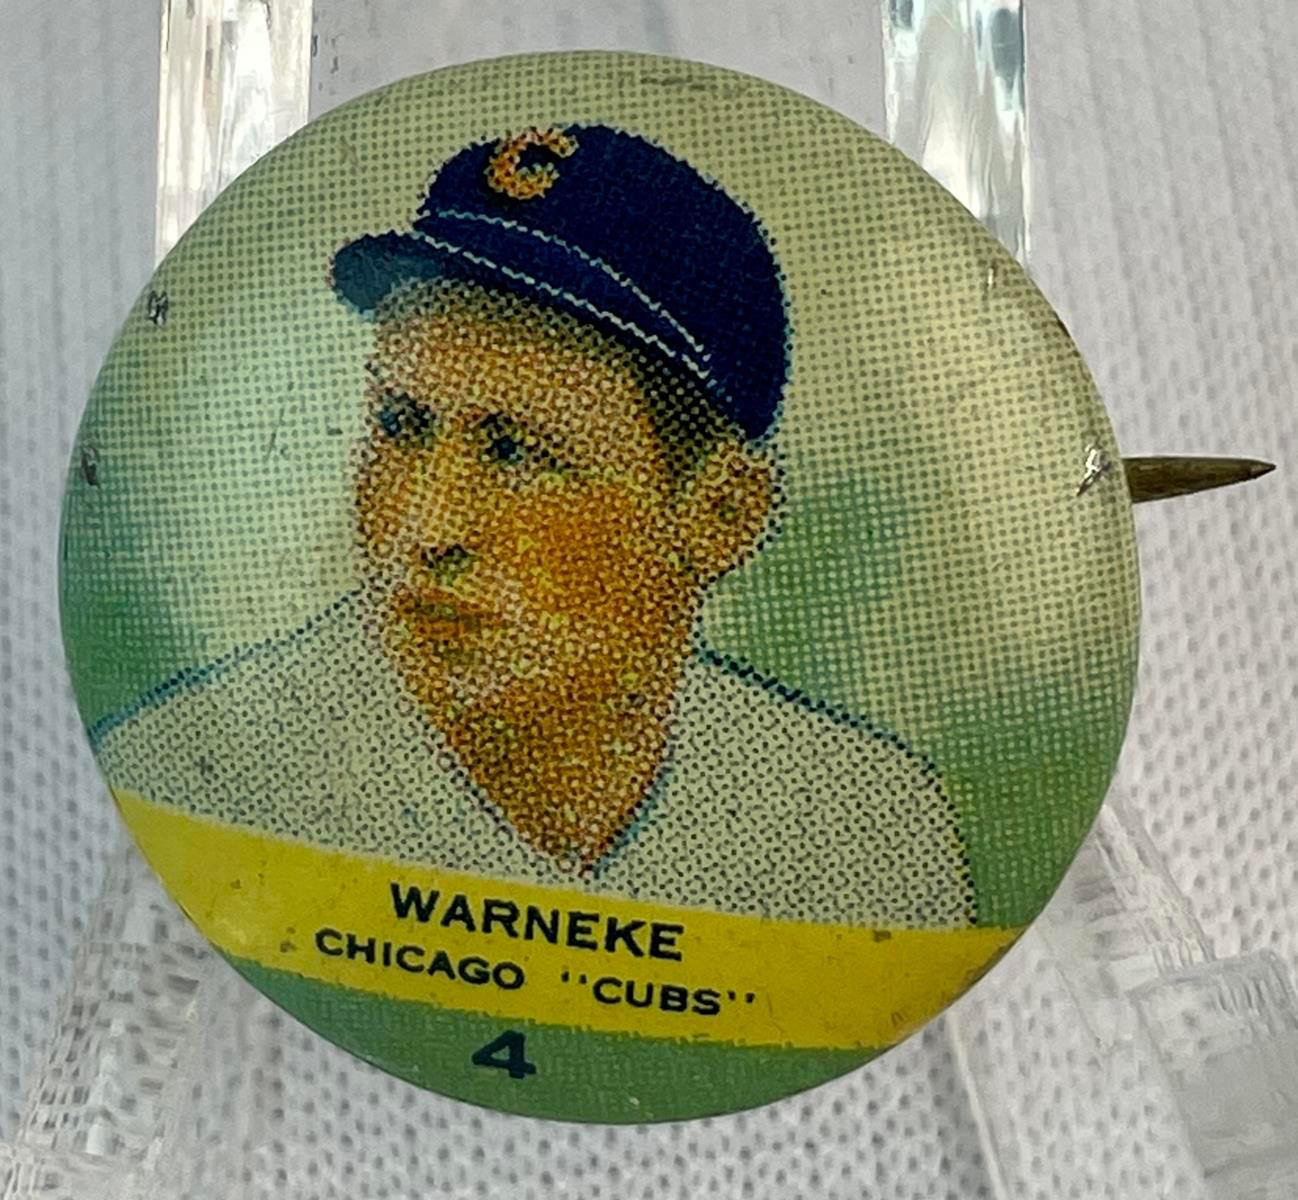 Vintage 1932 No. 4 Lon Warneke Chicago Cubs Orbit Gum Baseball Pinback